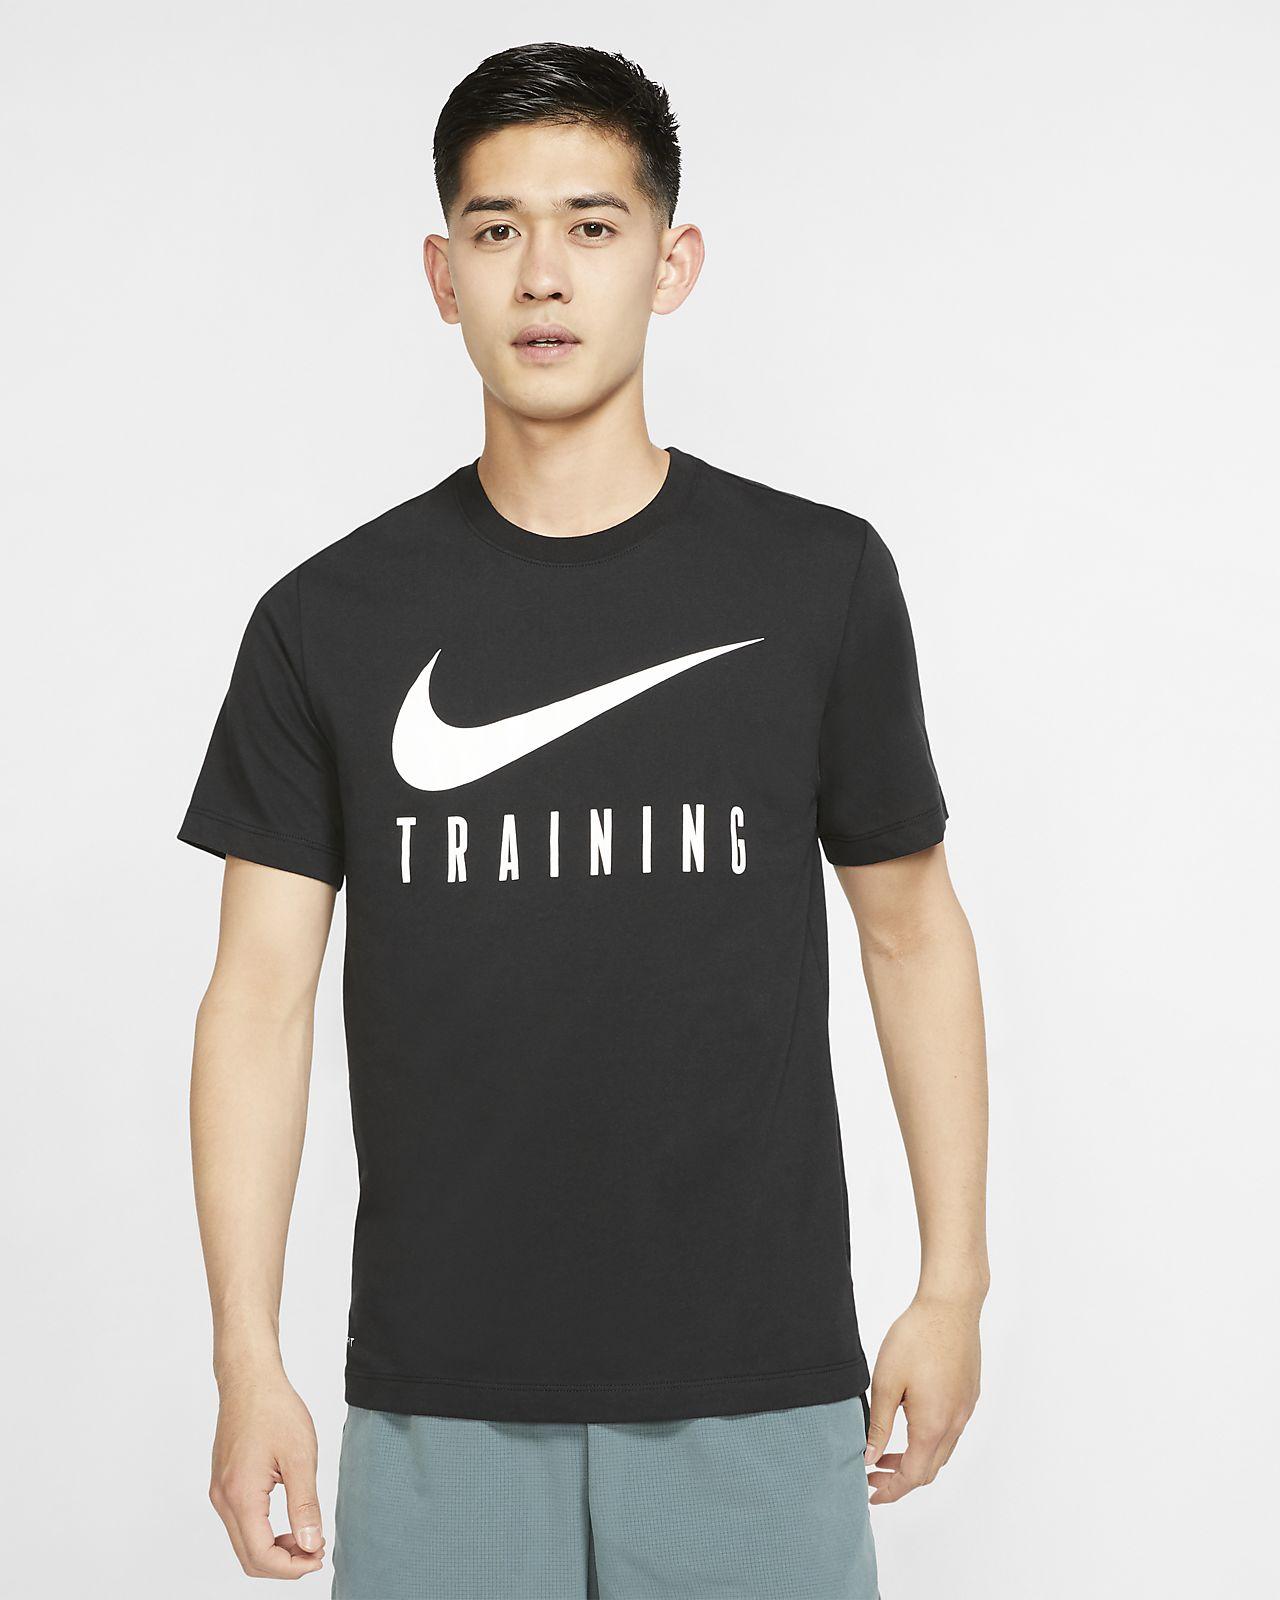 10e117783d6 NIKE公式】ナイキ Dri-FIT メンズ トレーニング Tシャツ.オンライン ...